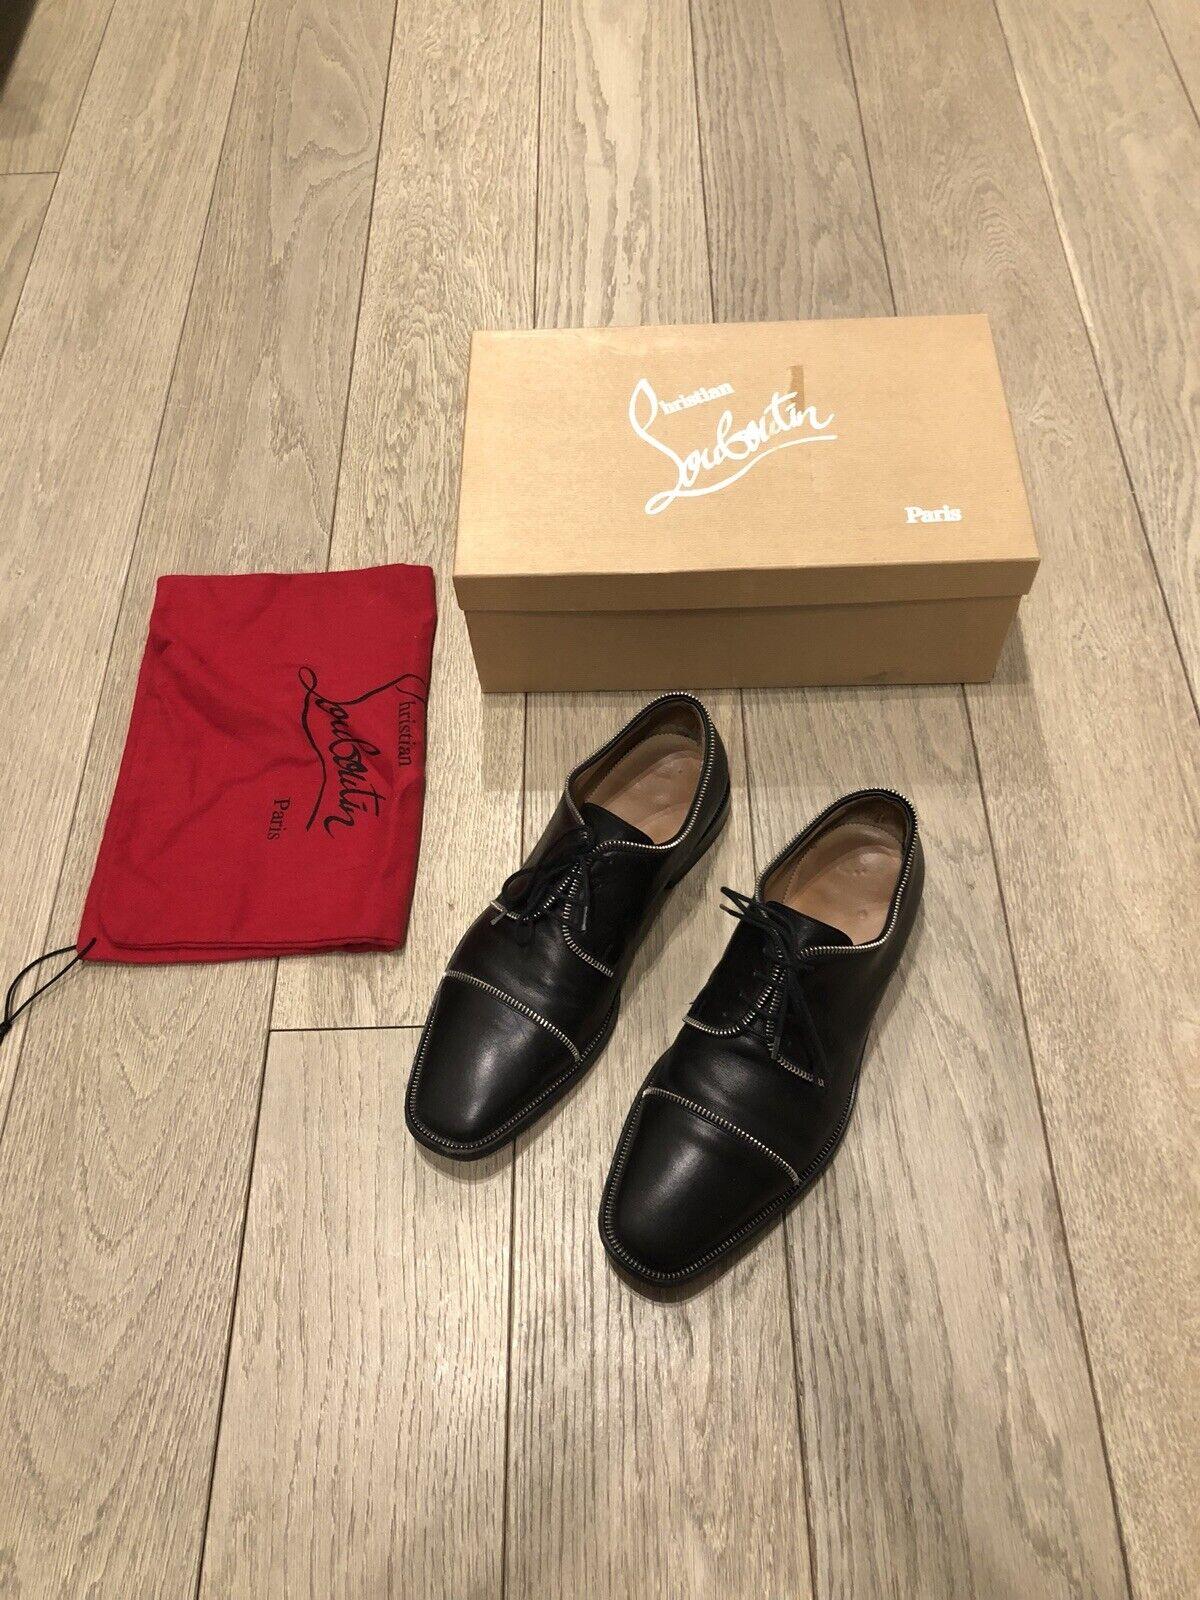 Christian louboutin Zipper Oxford Dress shoes Size 7.5 40.5 Mint in Box